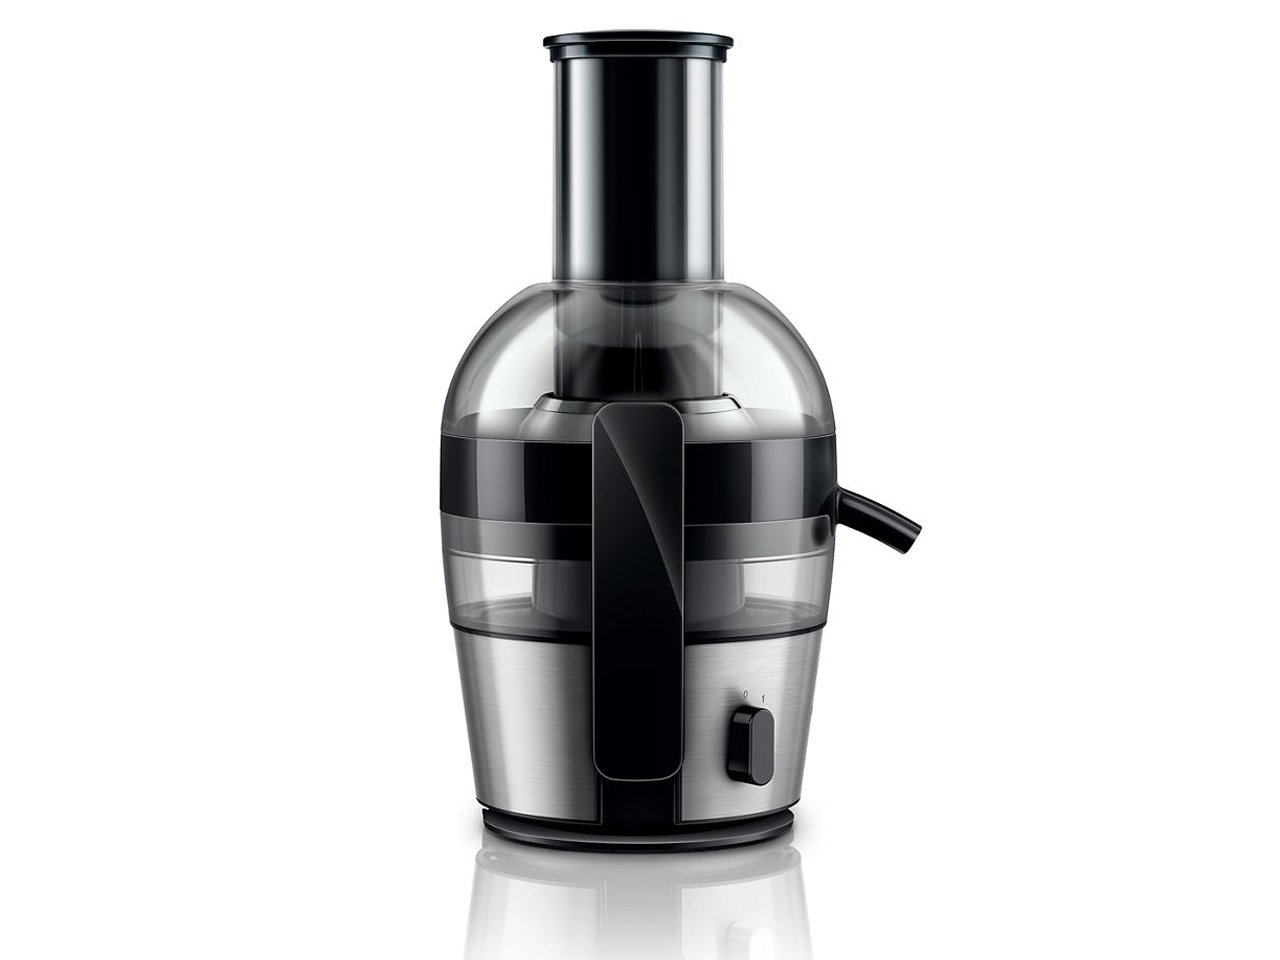 Philips HR1863/00 - Exprimidor eléctrico, 700 W, color negro ...